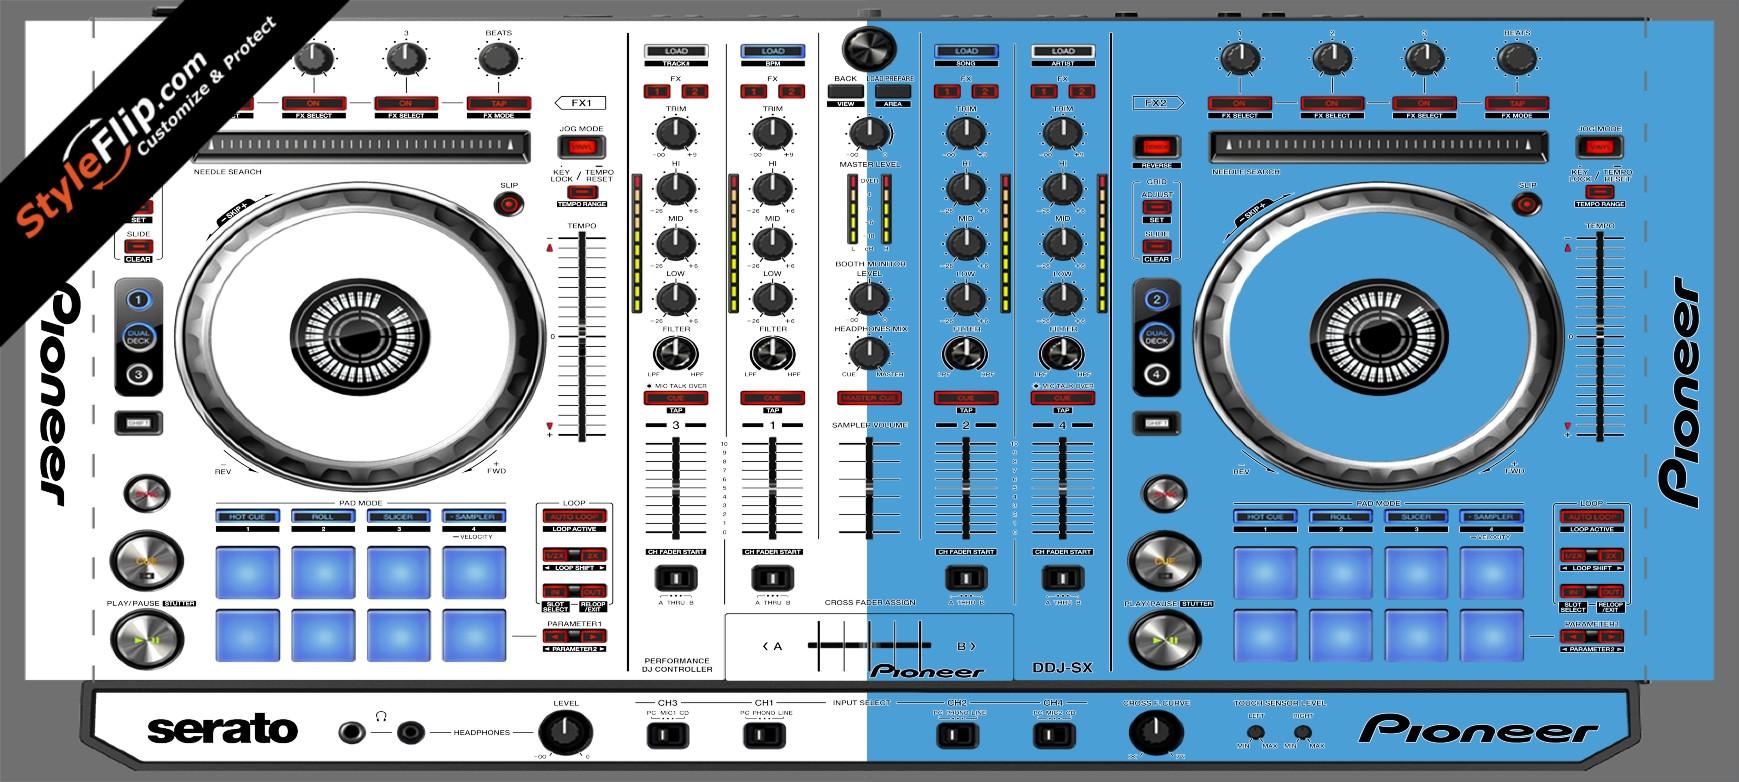 Blue & White Pioneer DDJ-SX